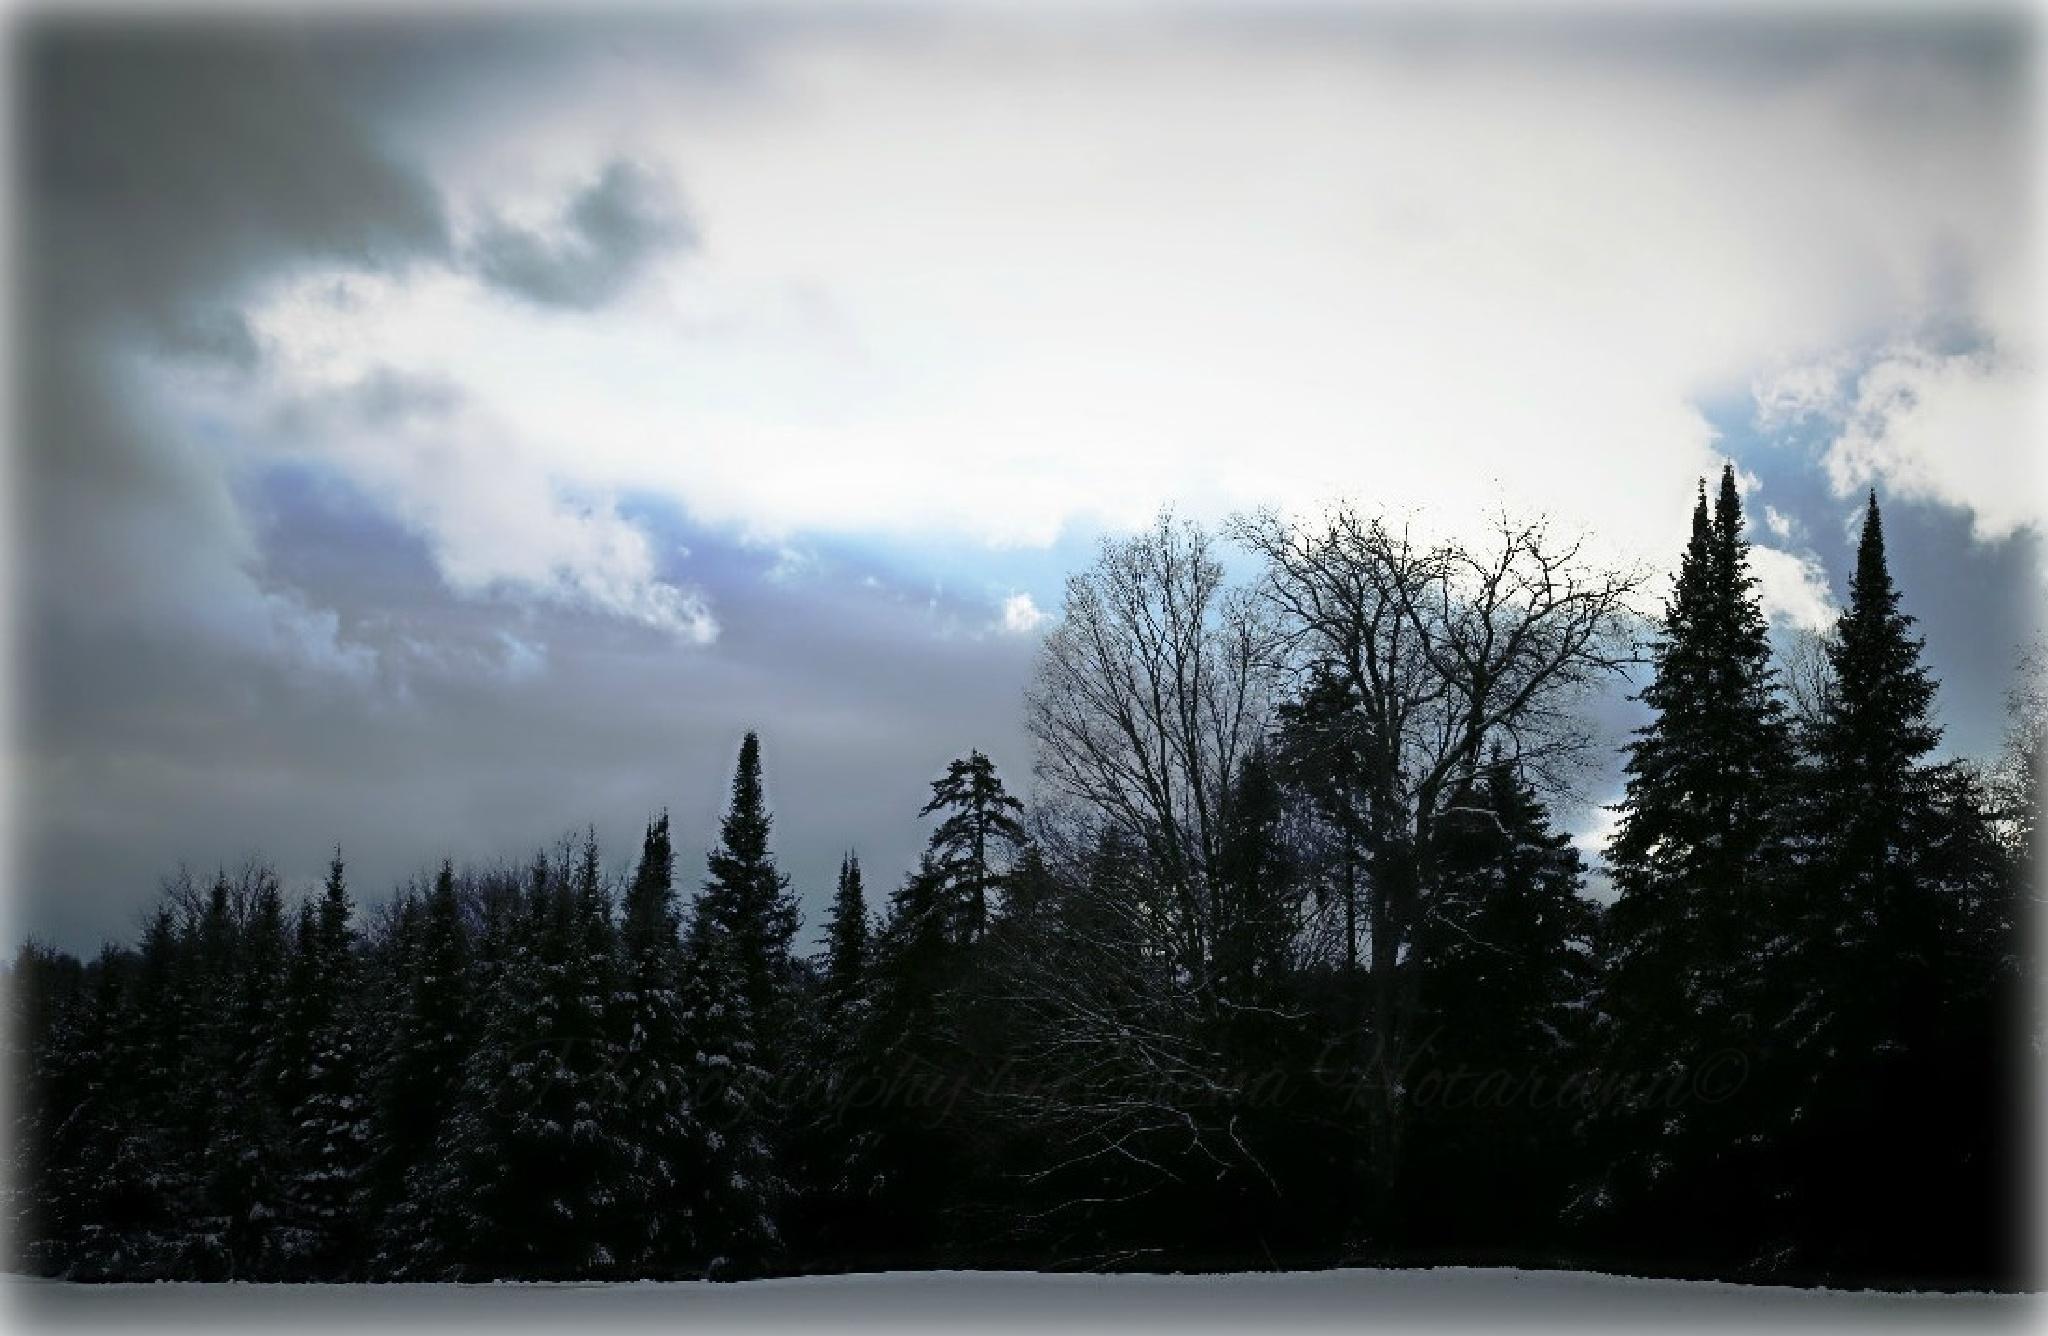 Moscow Woods, Vermont by Elena Hotaranu